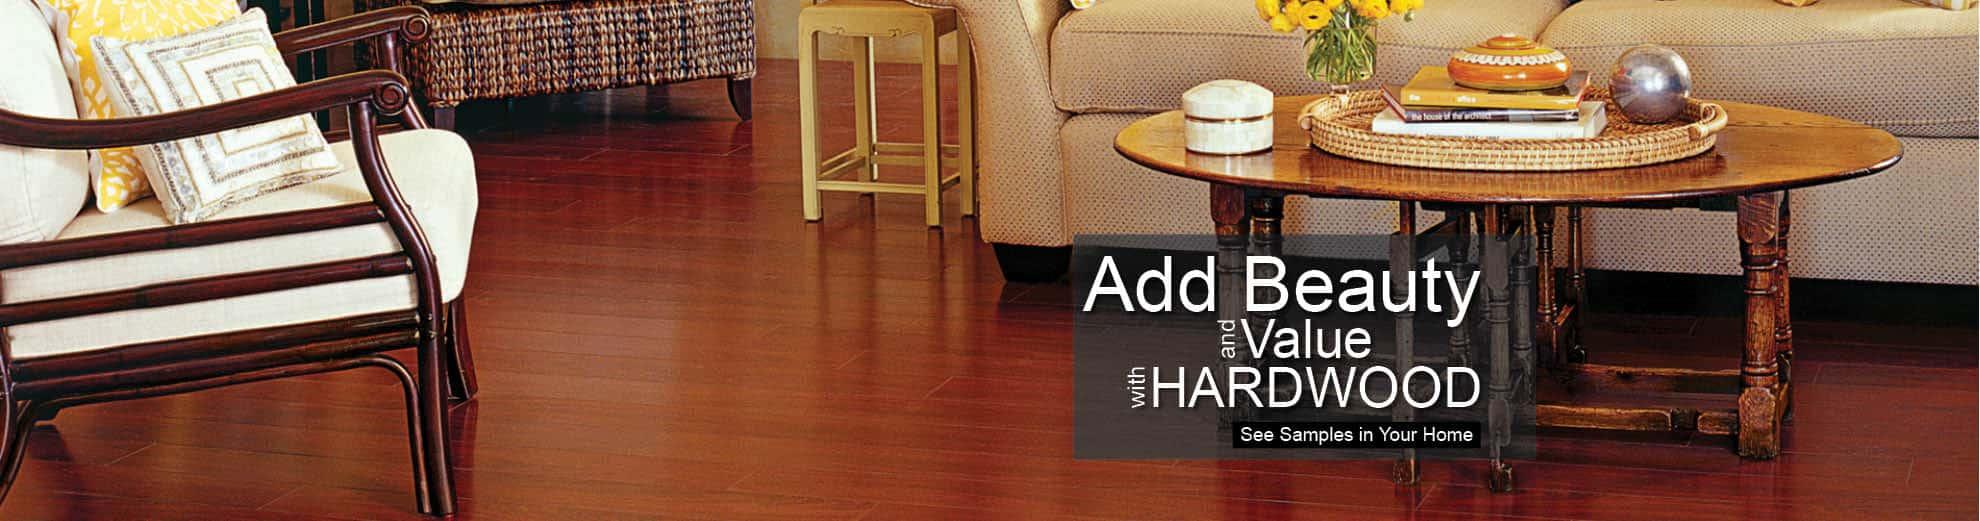 hardwood 1c 150